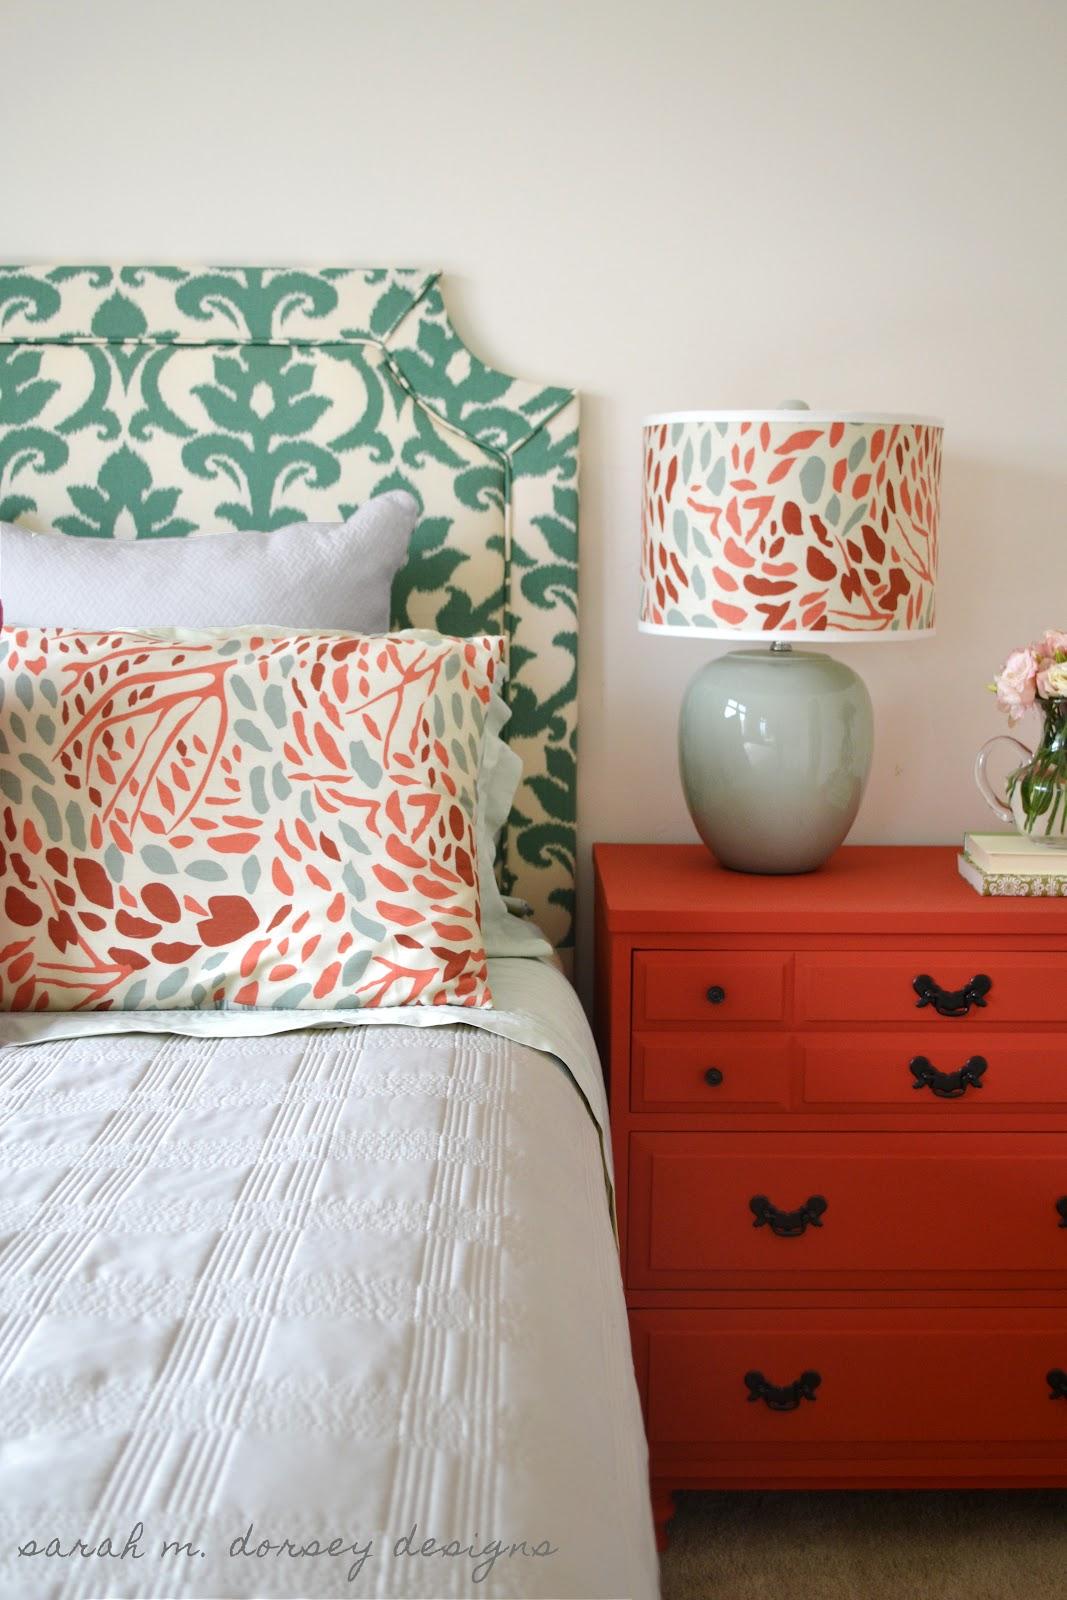 Diy bed headboard fabric - Diy Belgrave Headboard With Ikat Fabric For The Guest Bedroom